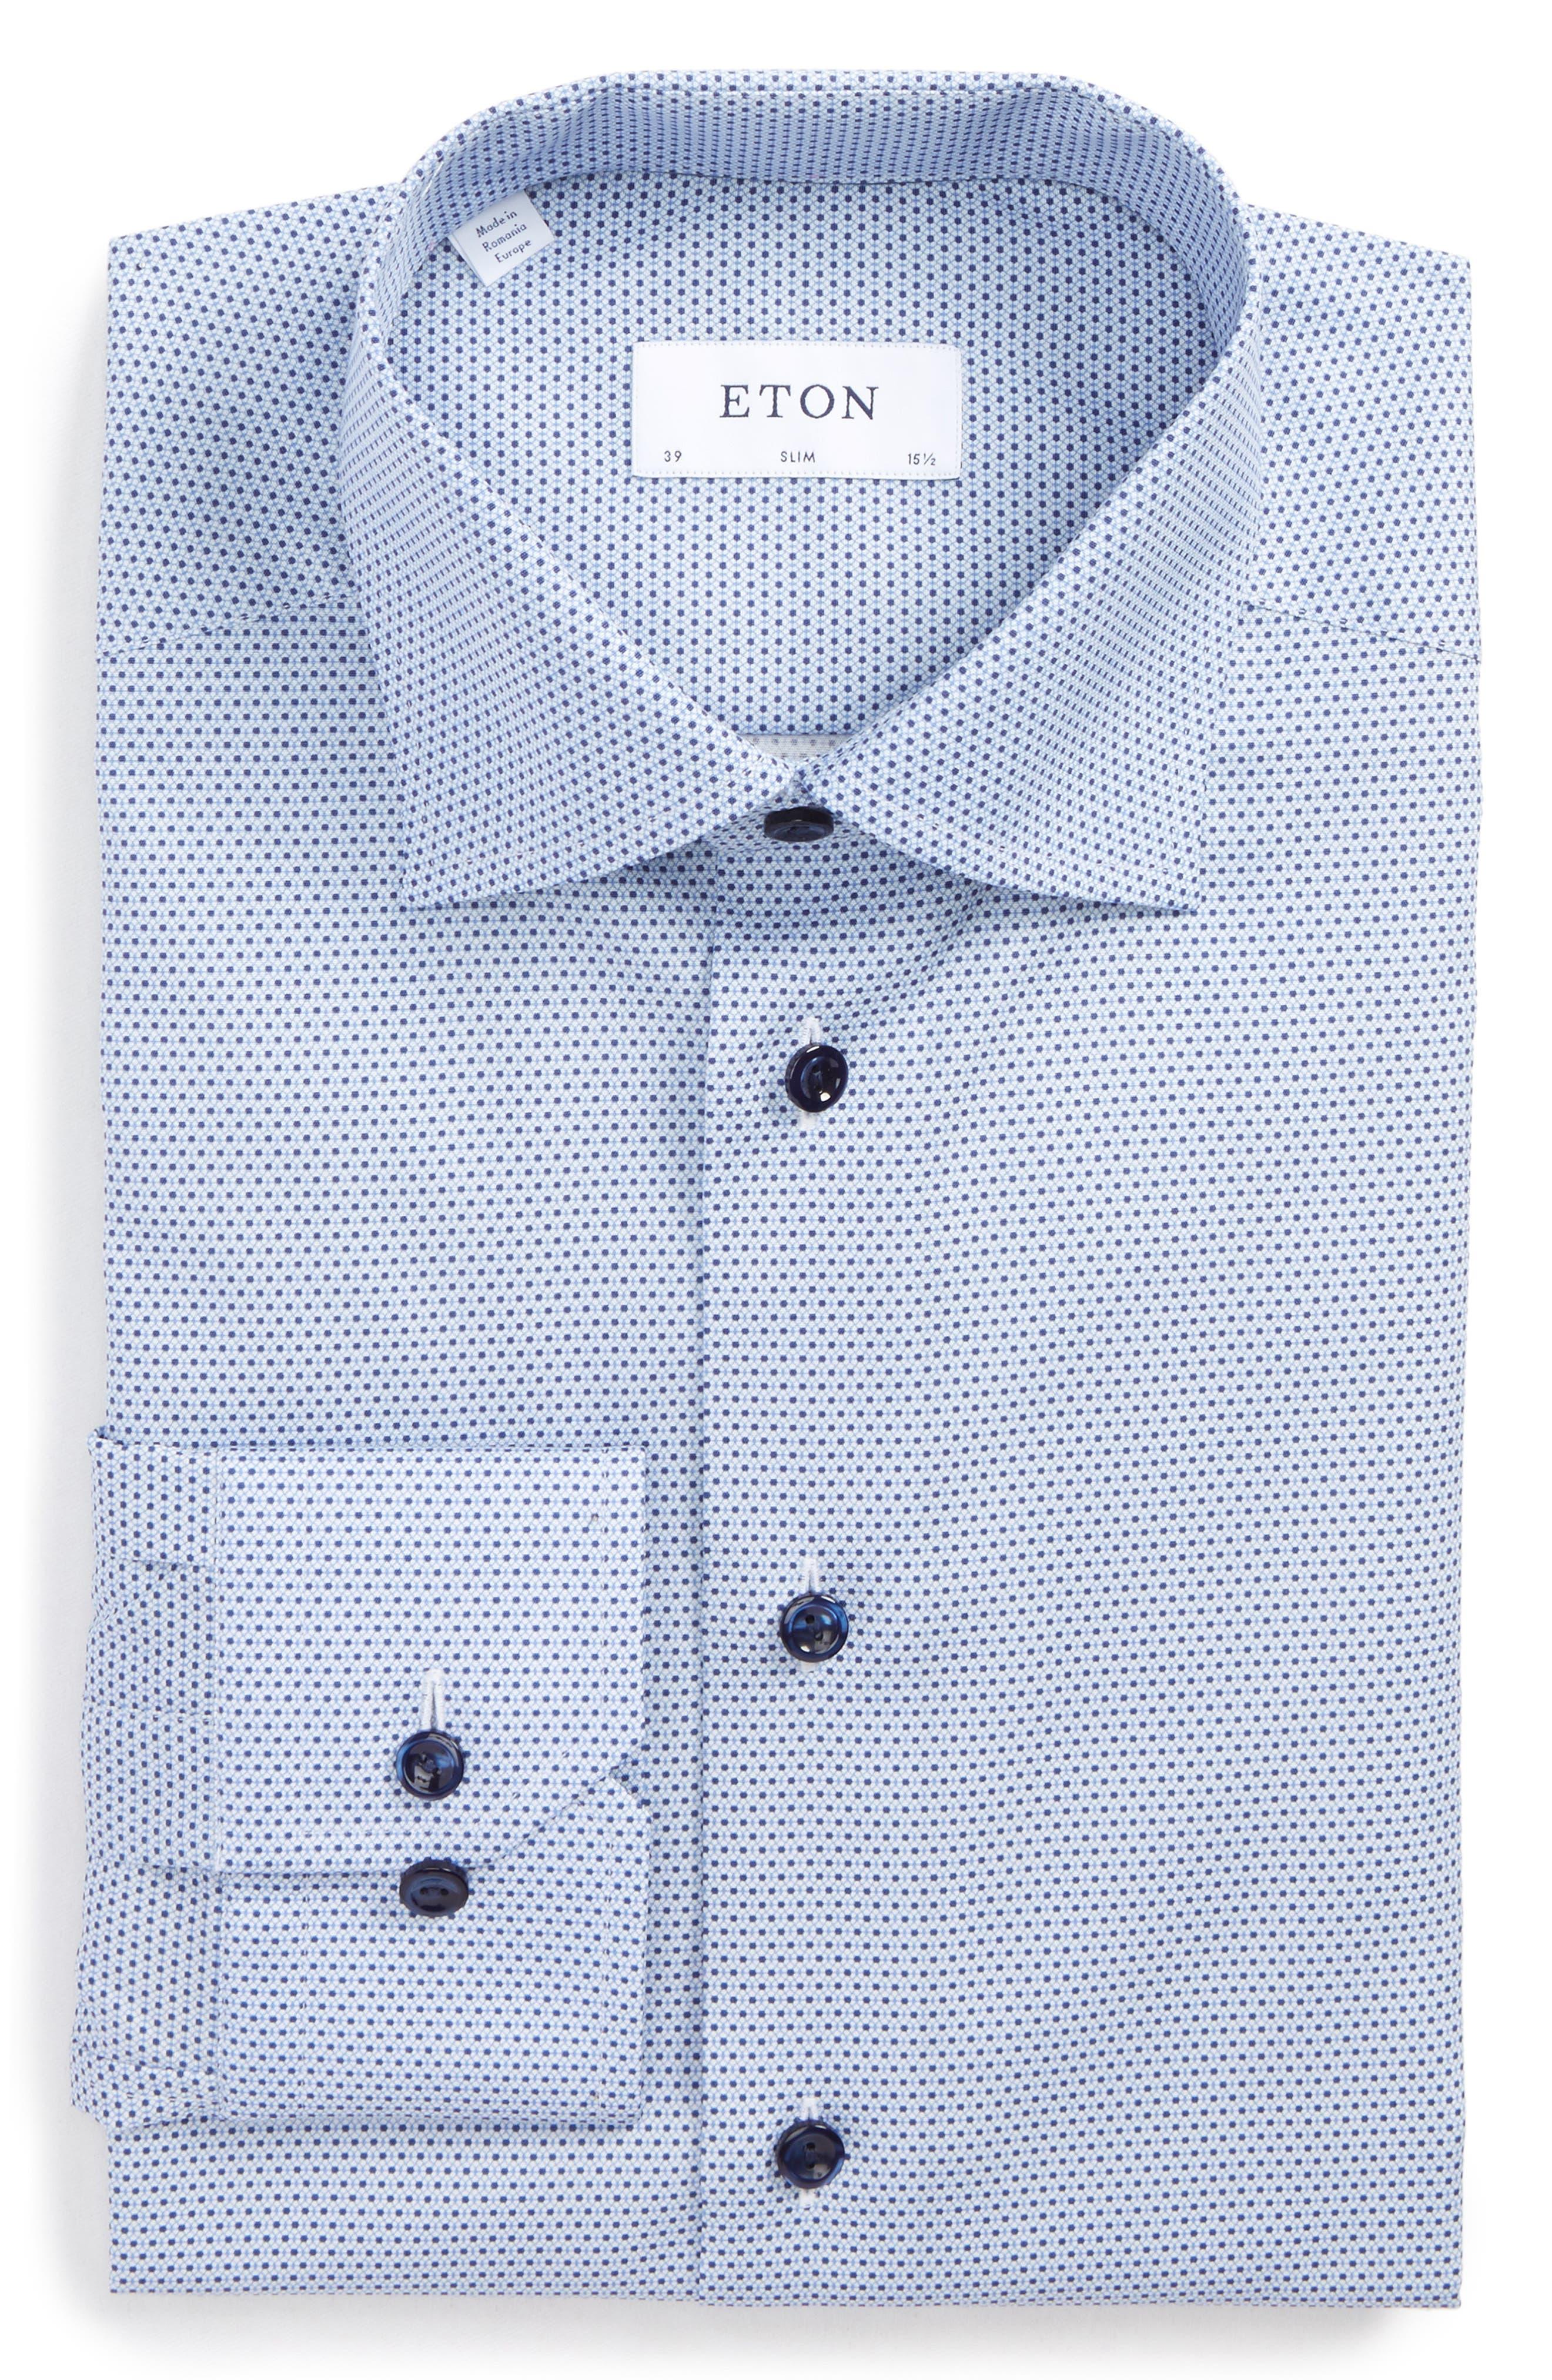 Main Image - Eton Slim Fit Microprint Dress Shirt